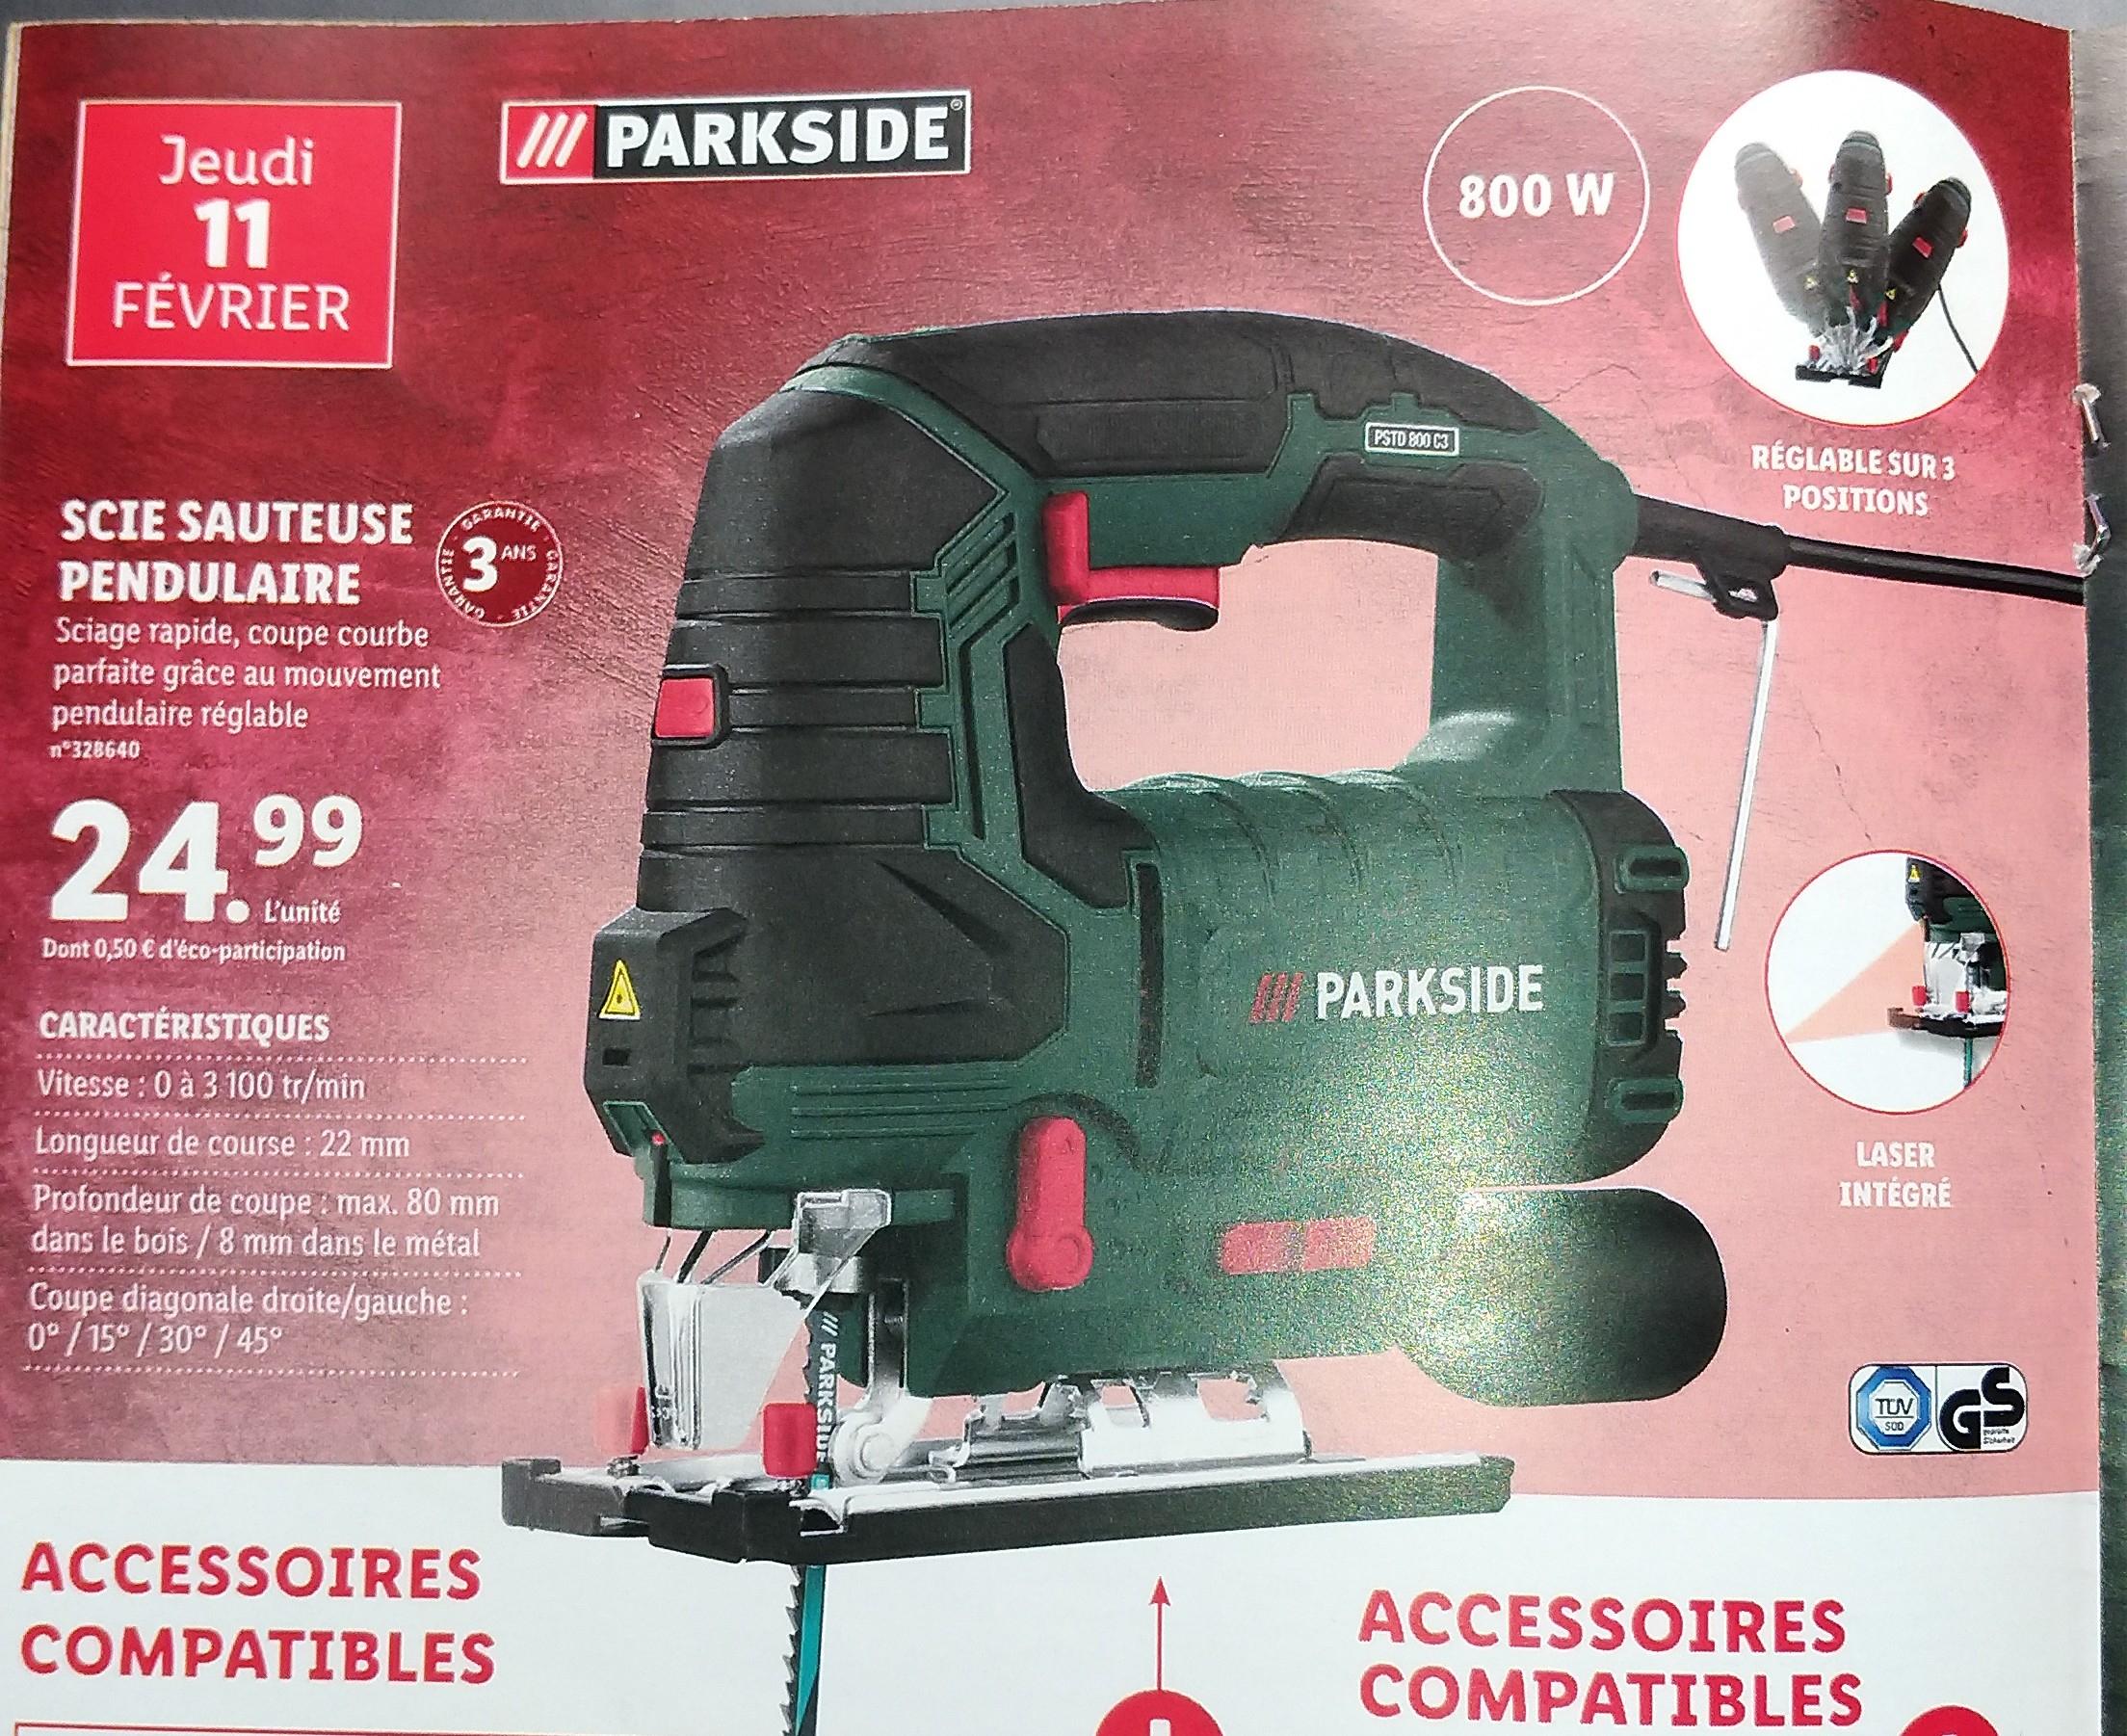 Scie sauteuse pendulaire ParkSide PSTD 800 C3 - 800 W